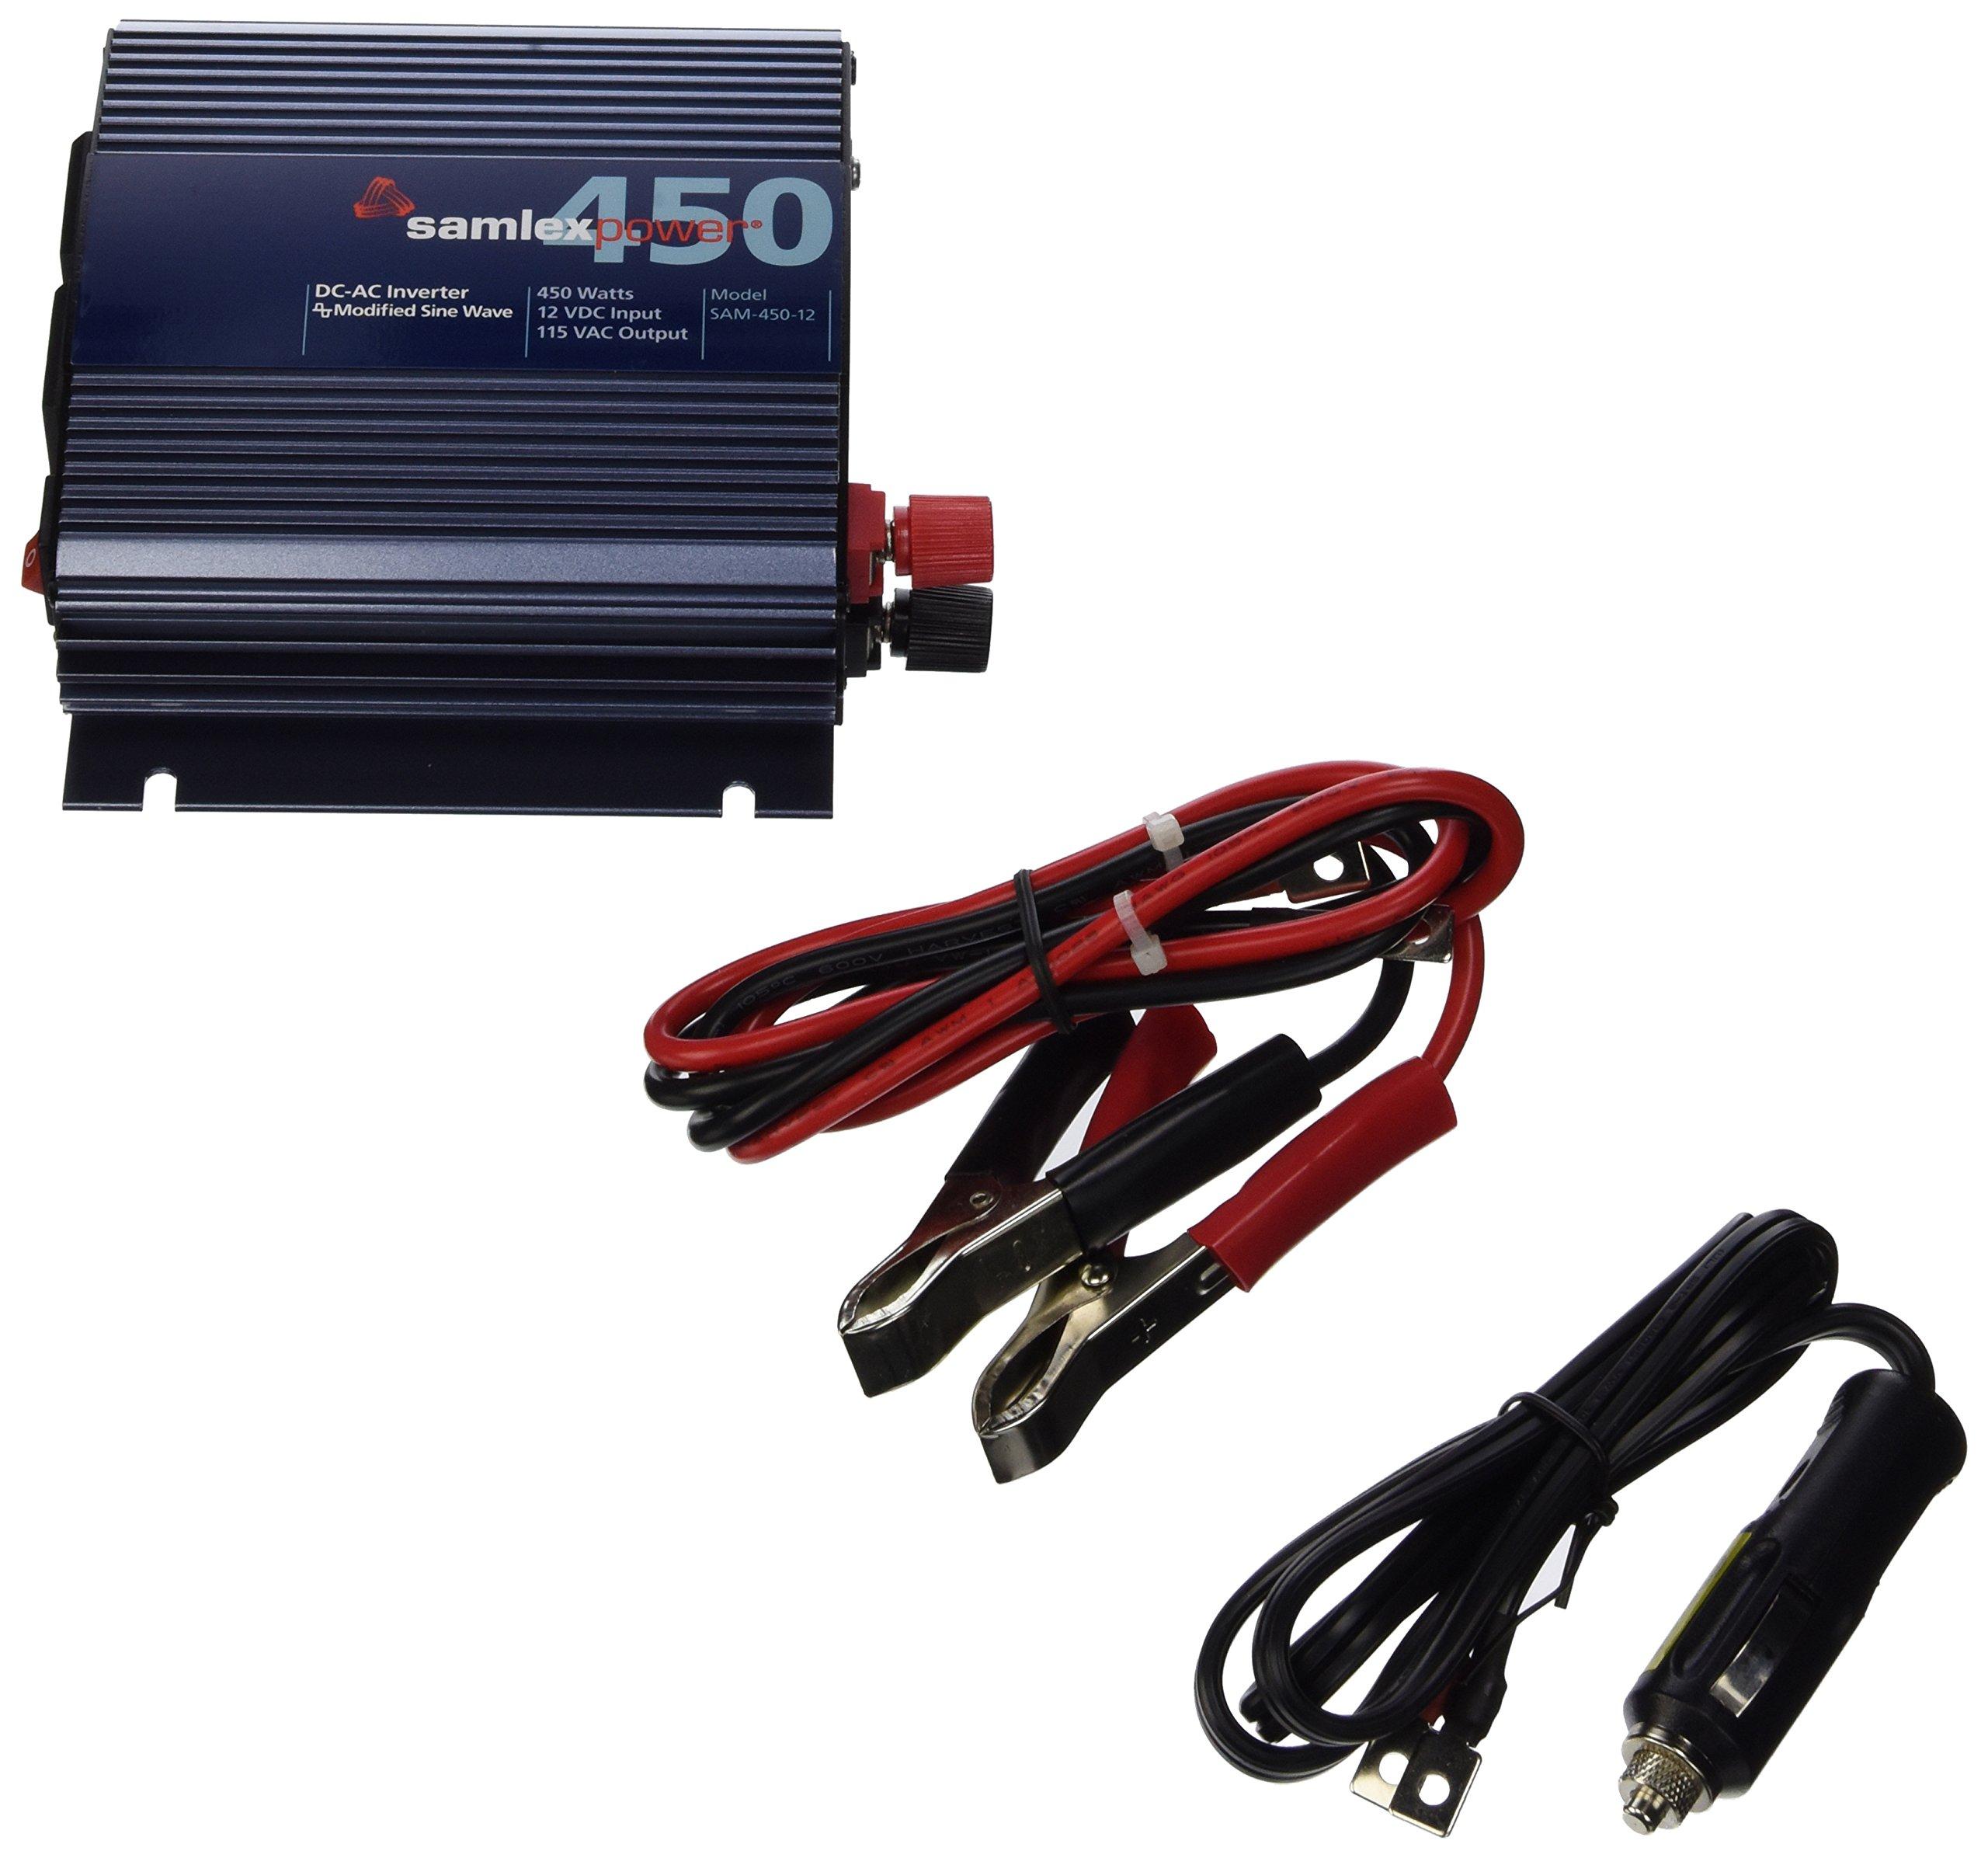 Samlex Solar SAM-450-12 SAM Series Modified Sine Wave Inverter by Samlex America